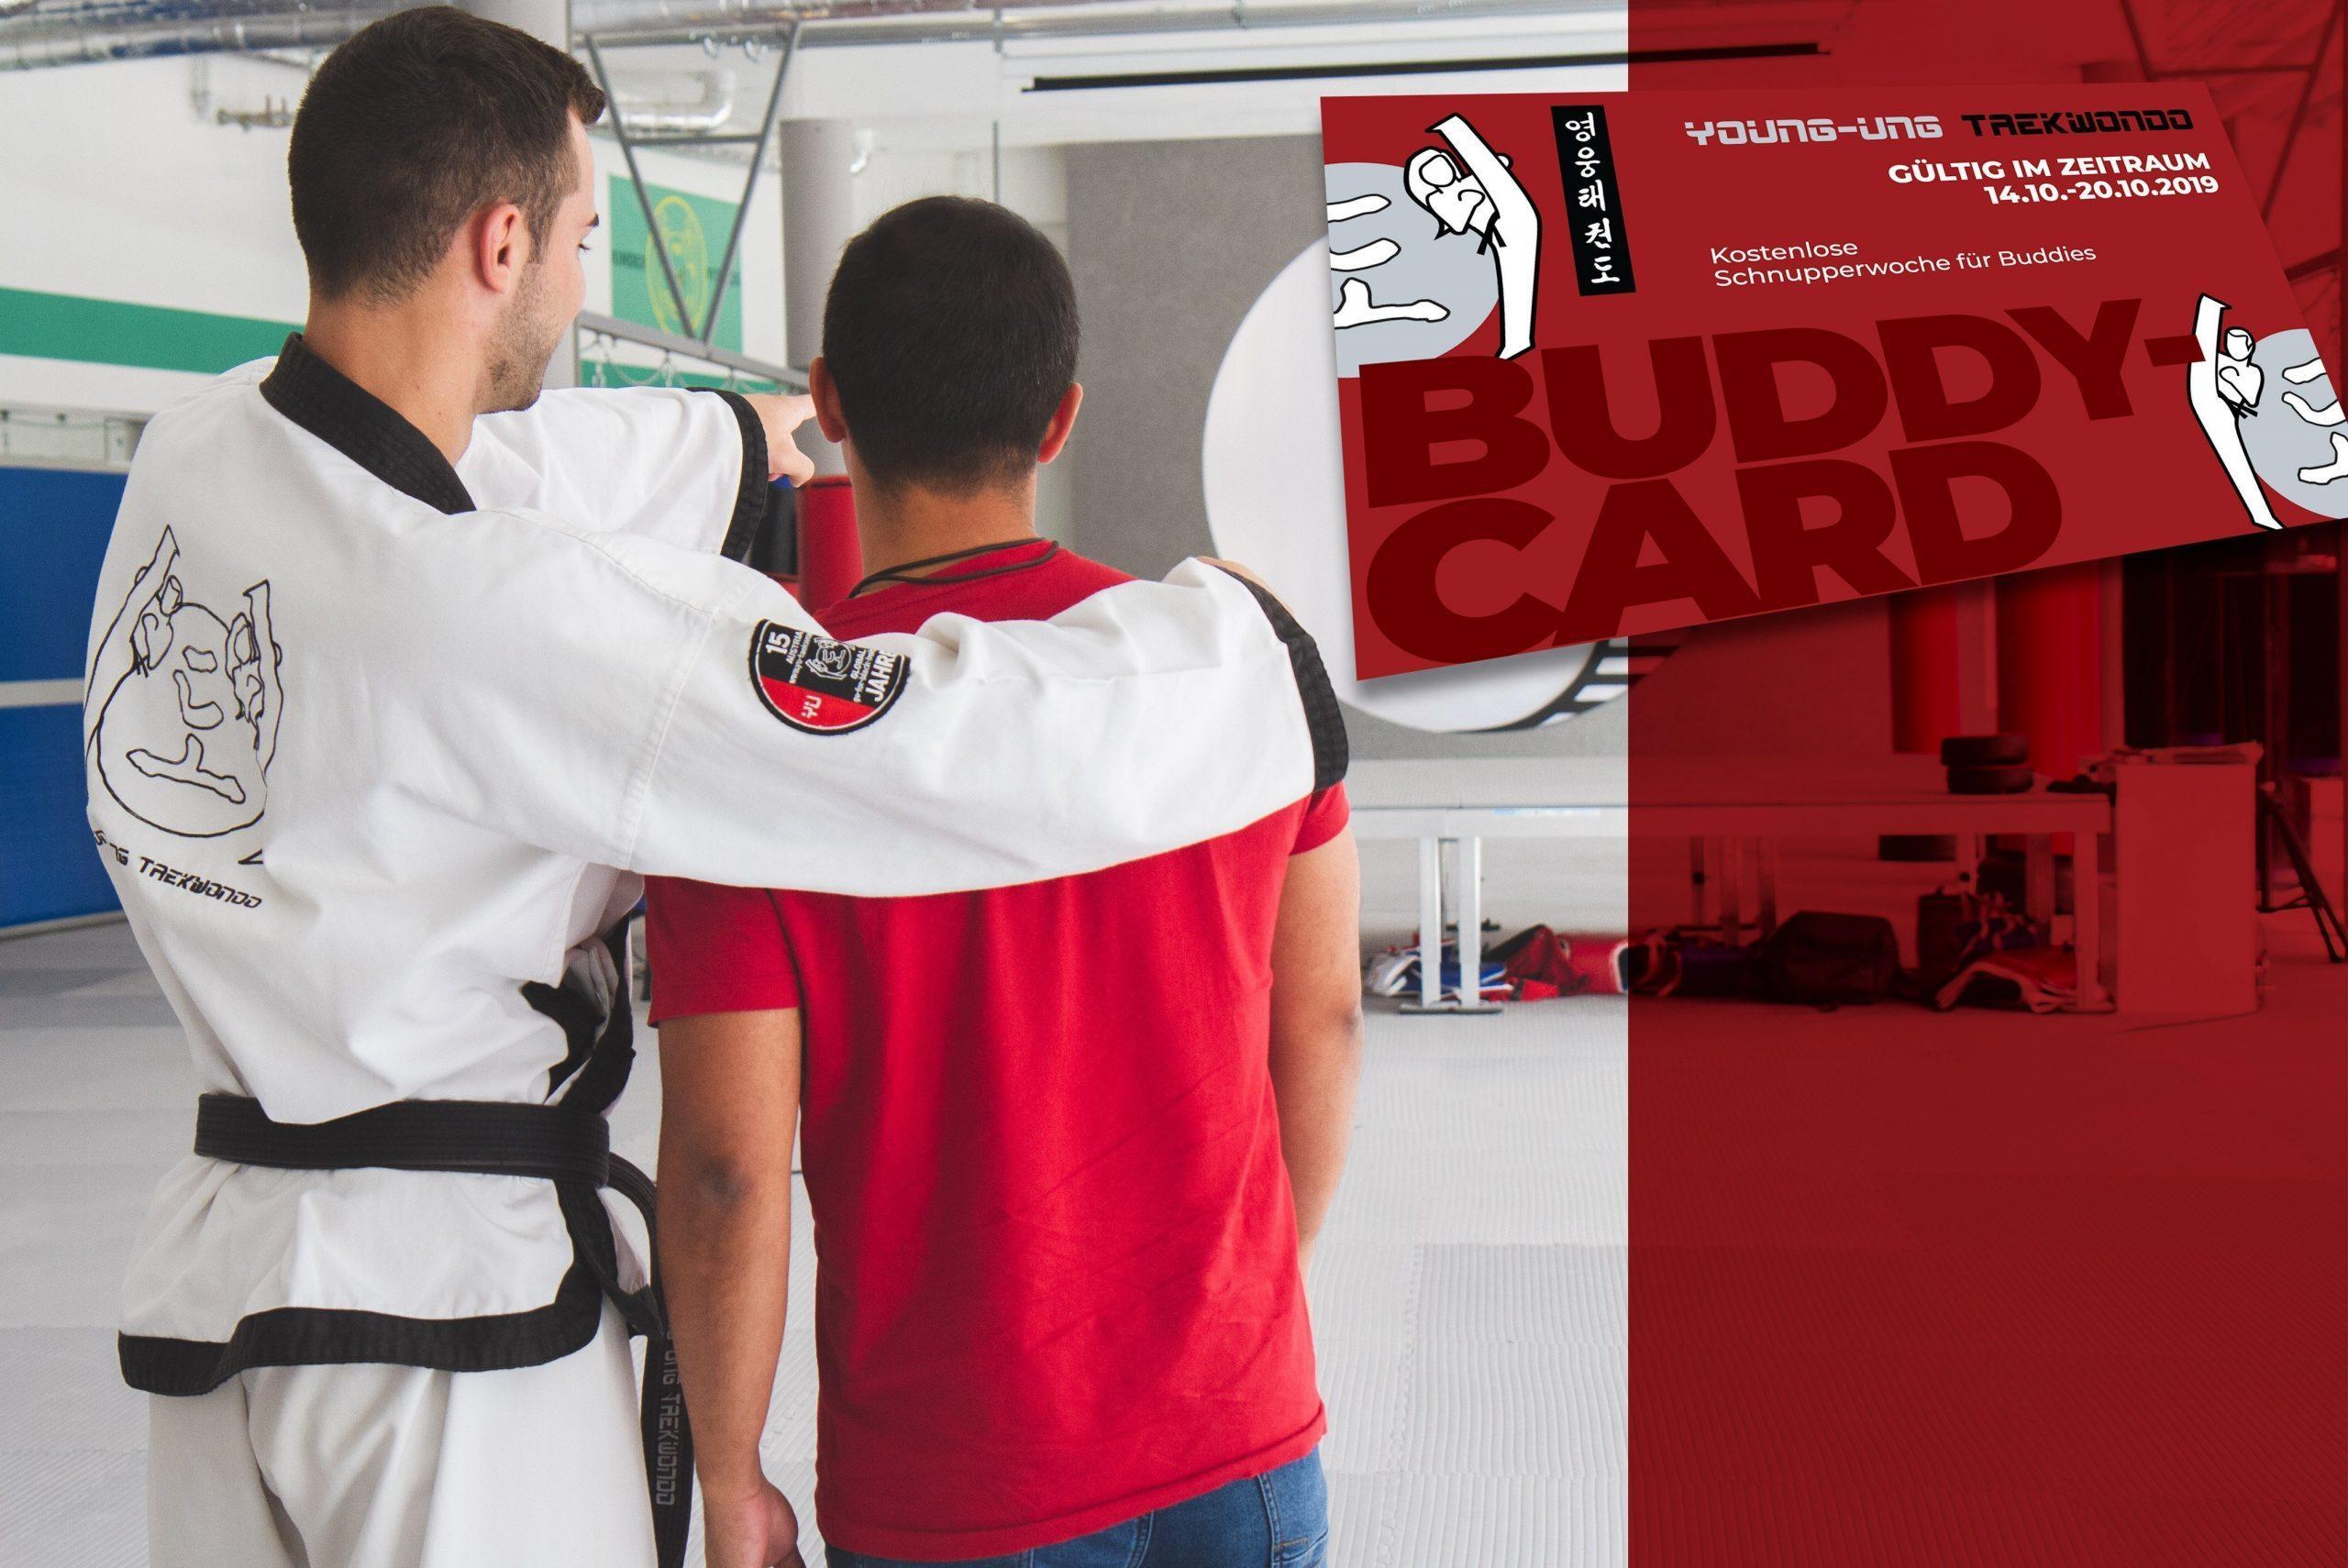 YOUNG-UNG Taekwondo Buddy Week